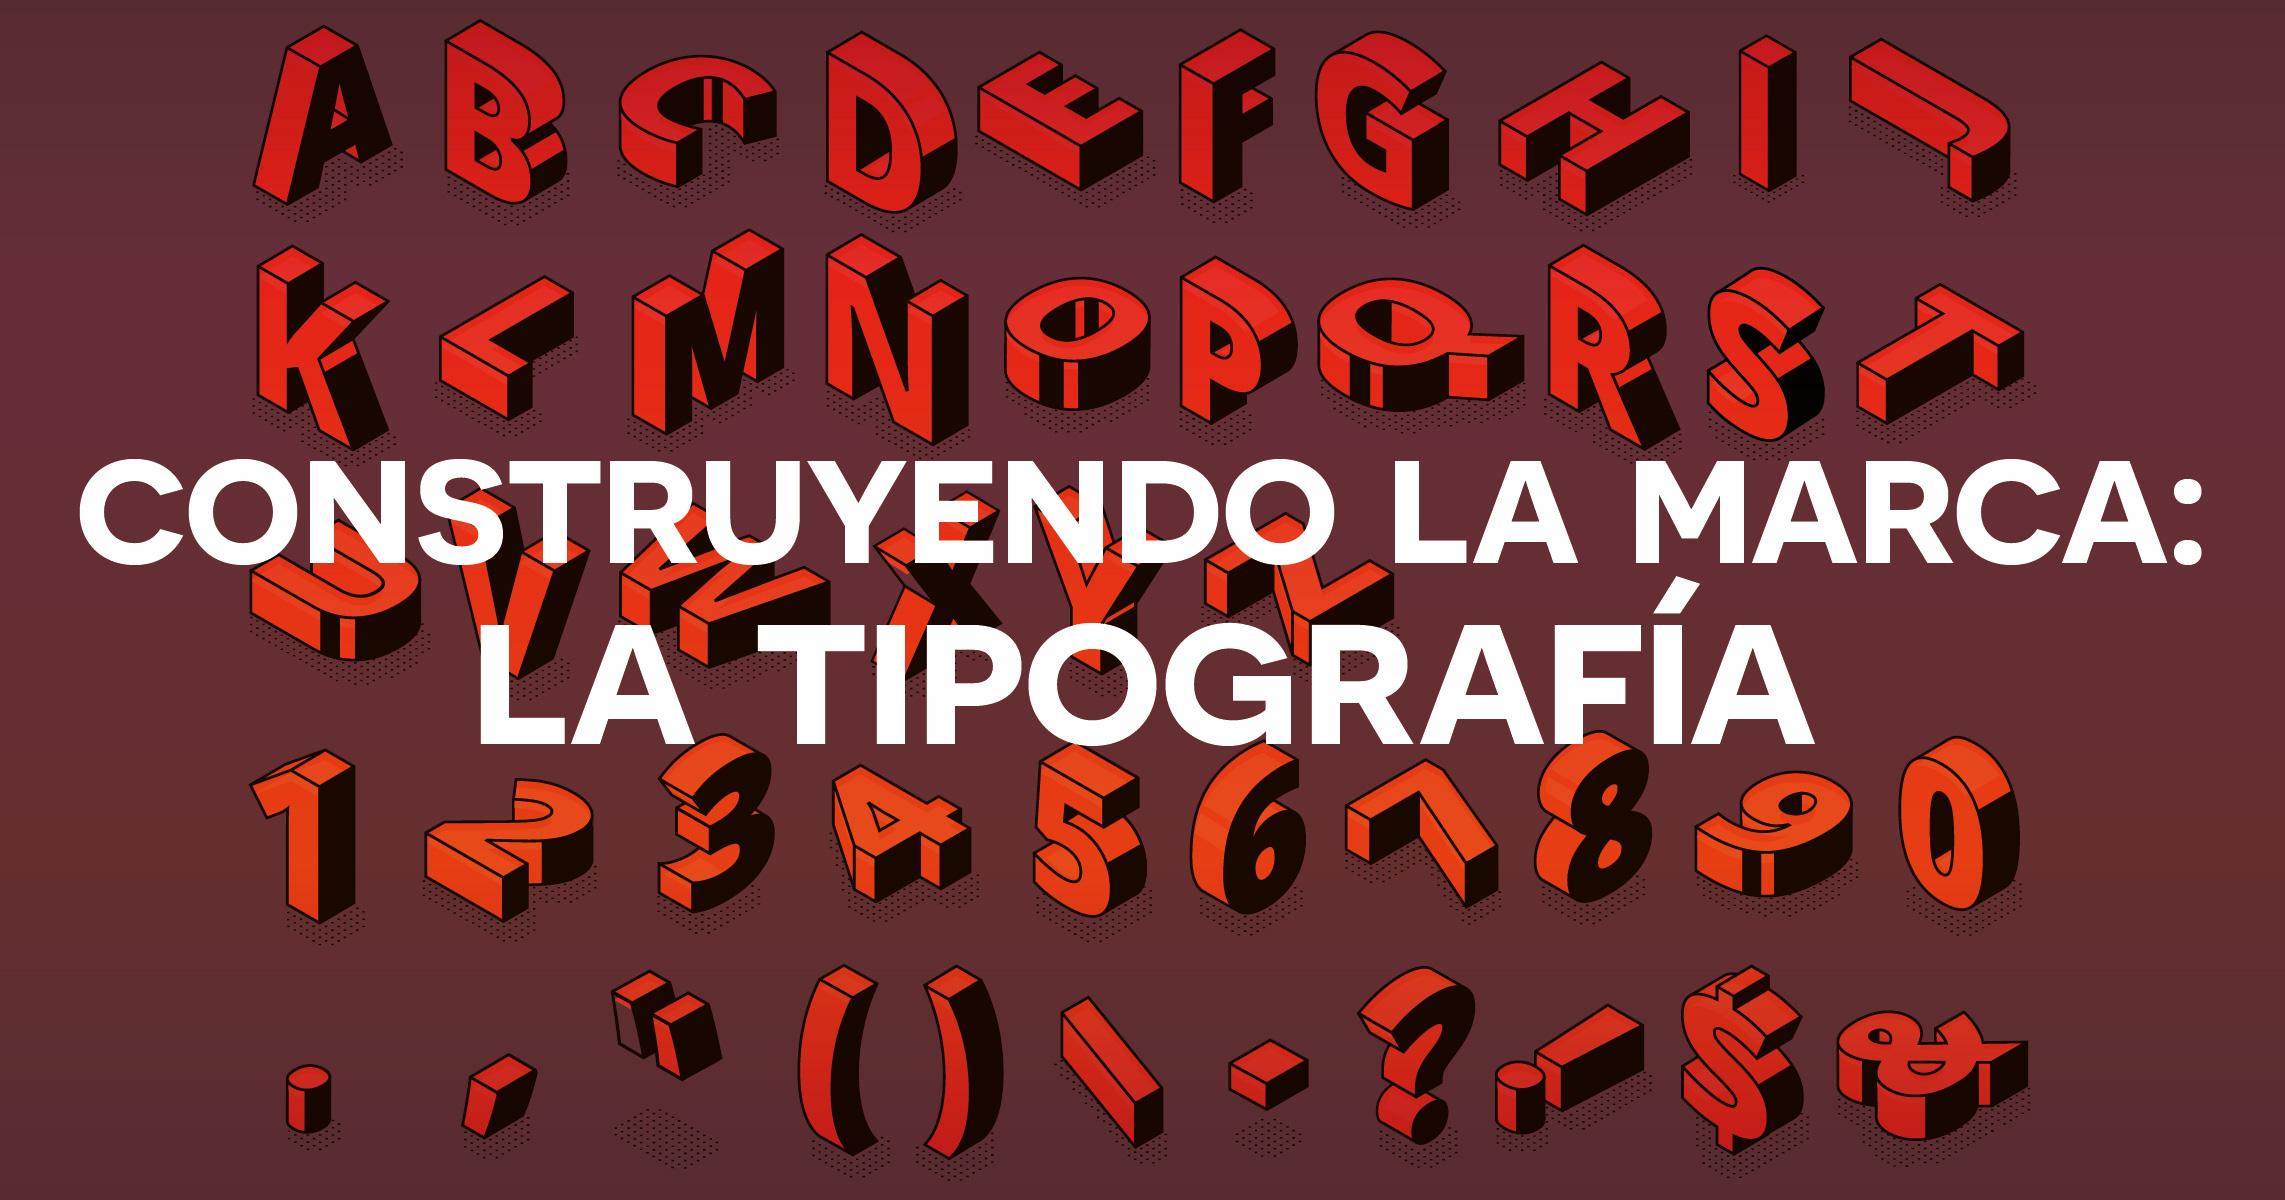 BP - construyendo_la_marca-la_tipografia